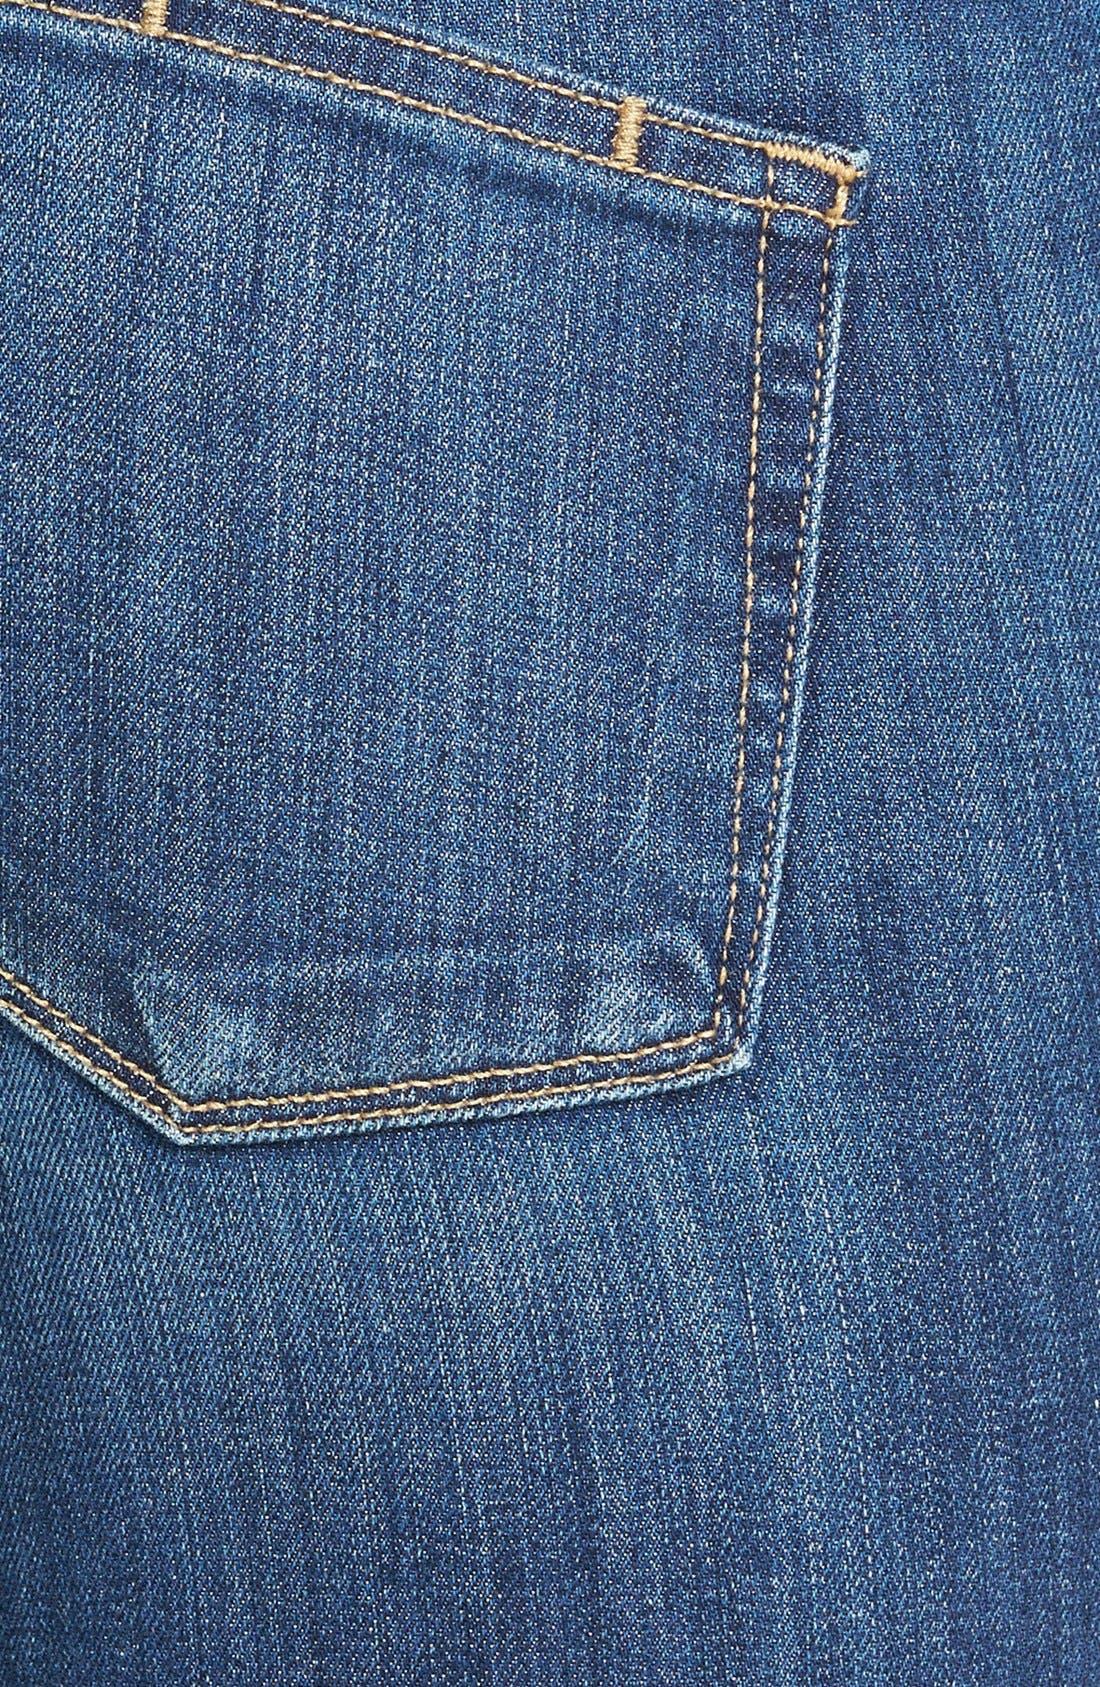 Alternate Image 3  - Paige Denim 'Skyline' Skinny Jeans (Orson Blue)